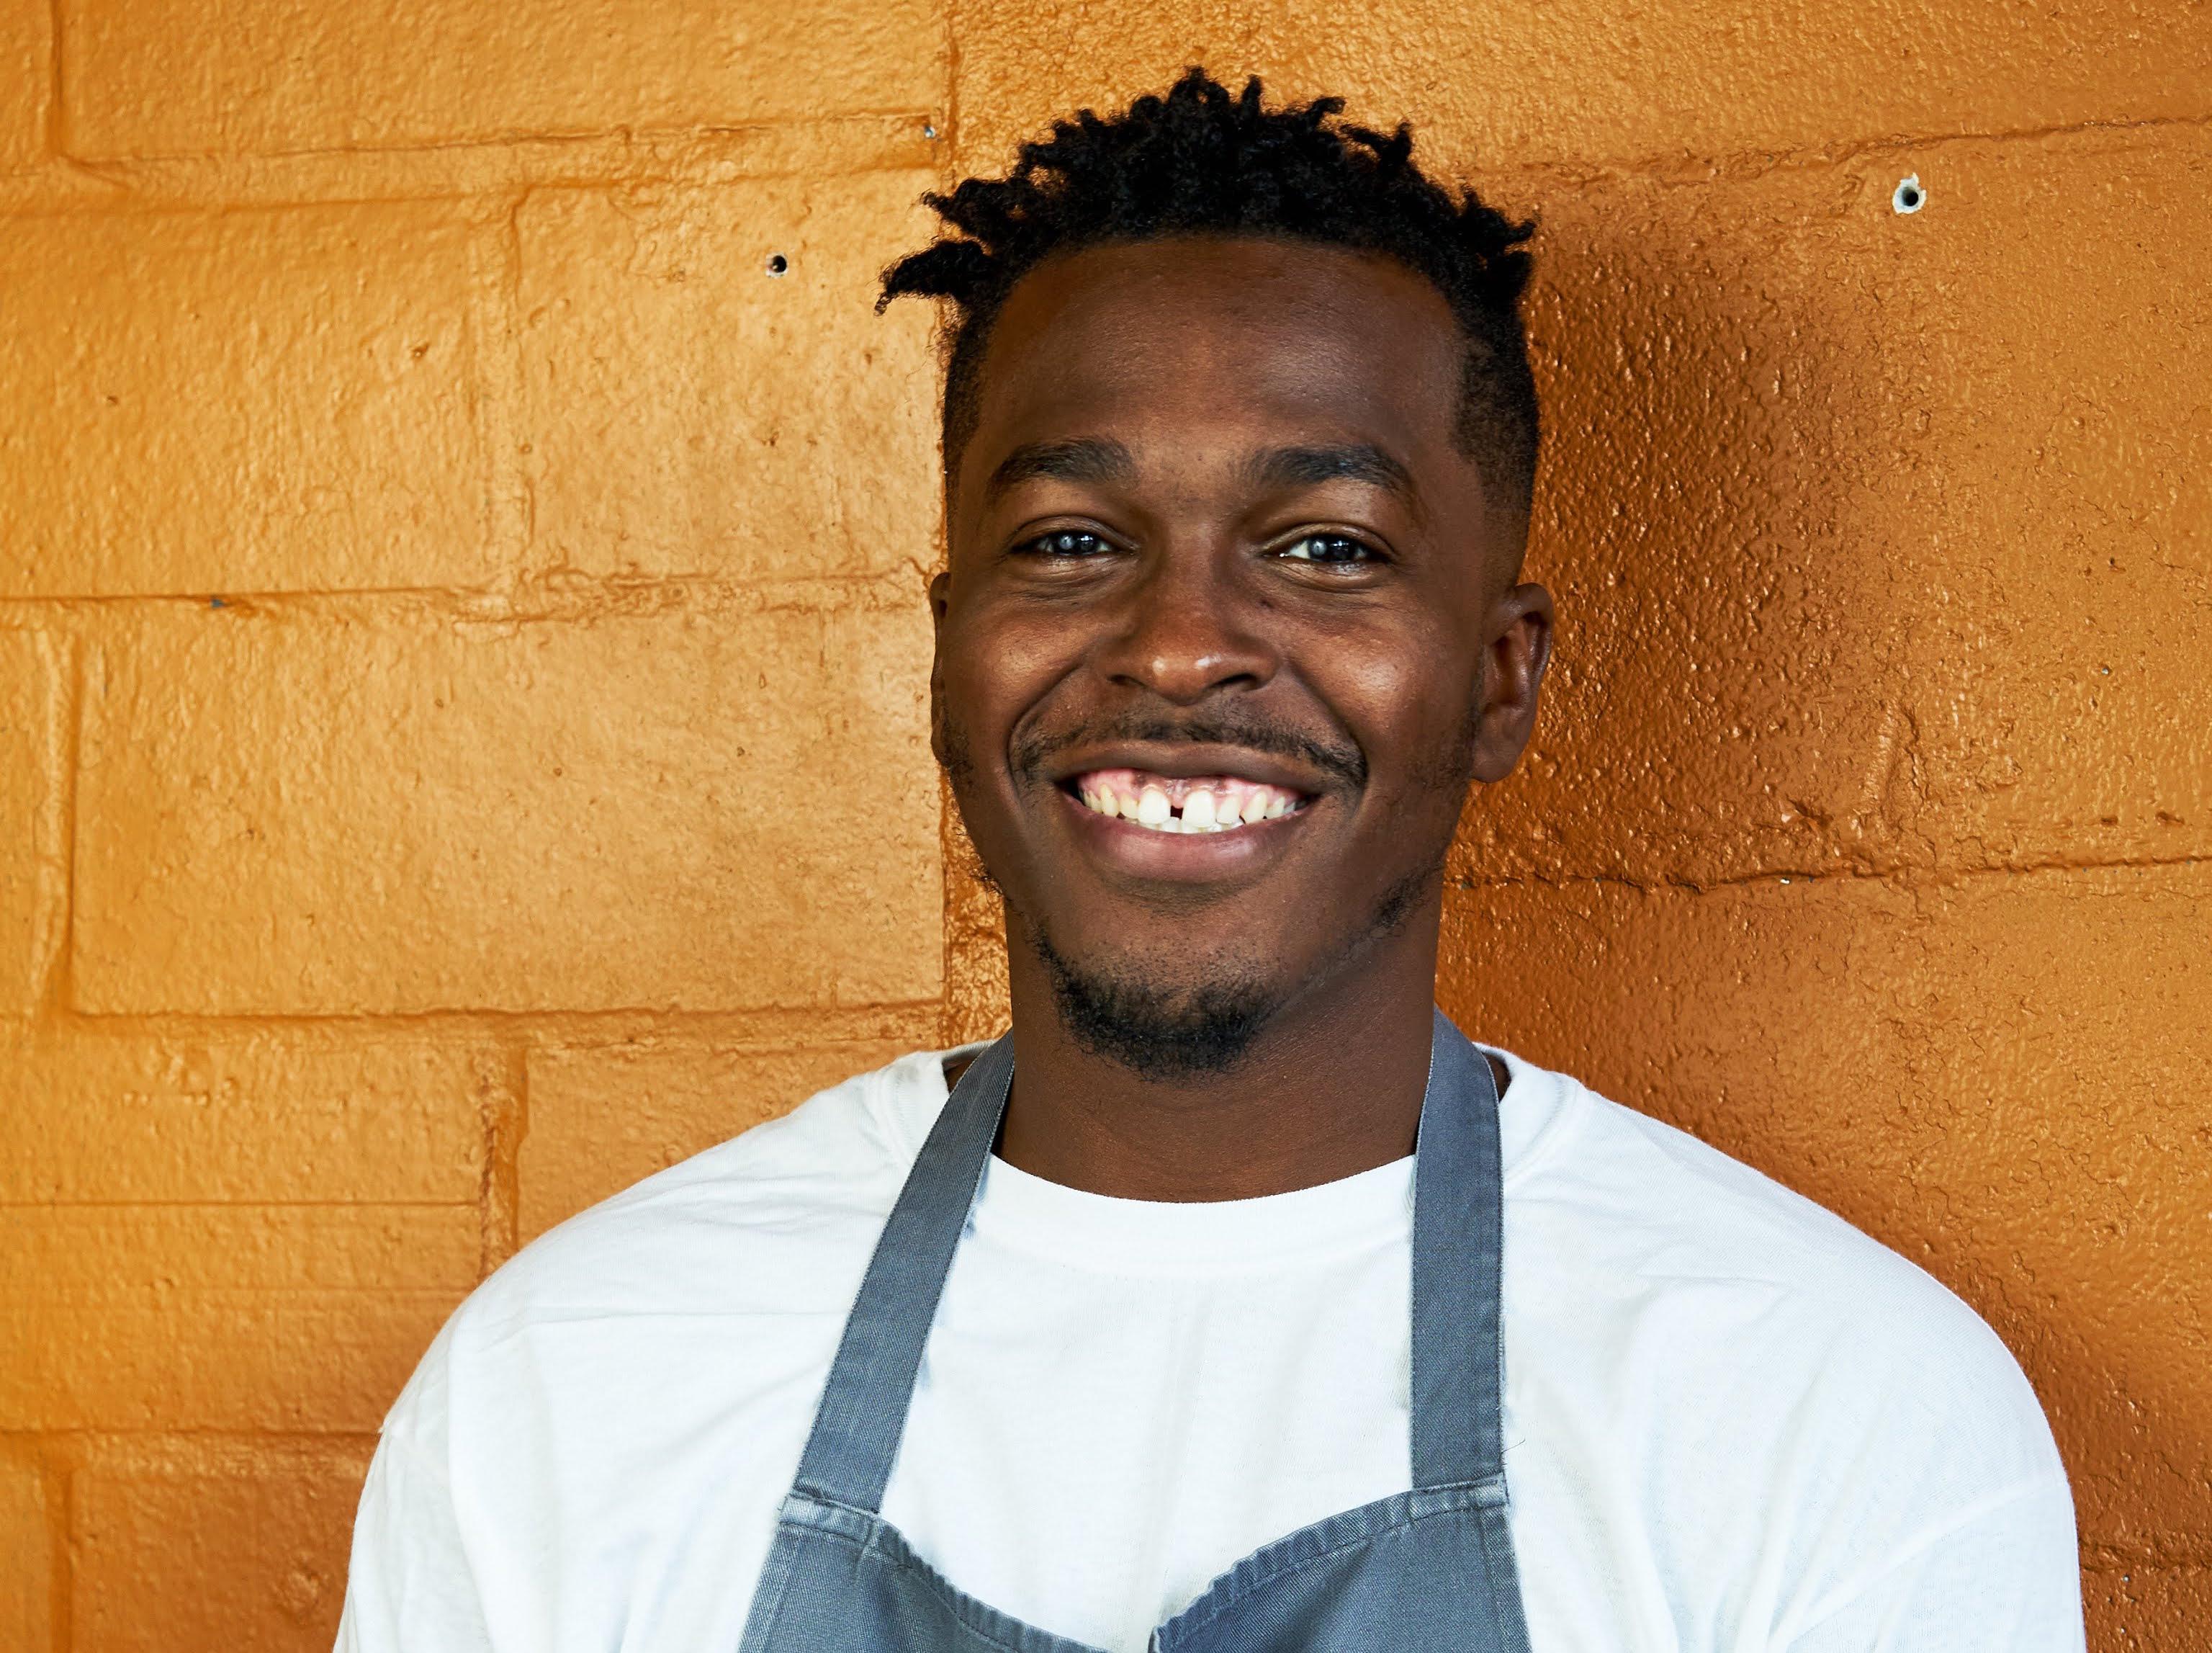 Indigo Chef Jonny Rhodes Calls Out Racism in Restaurant Reviews